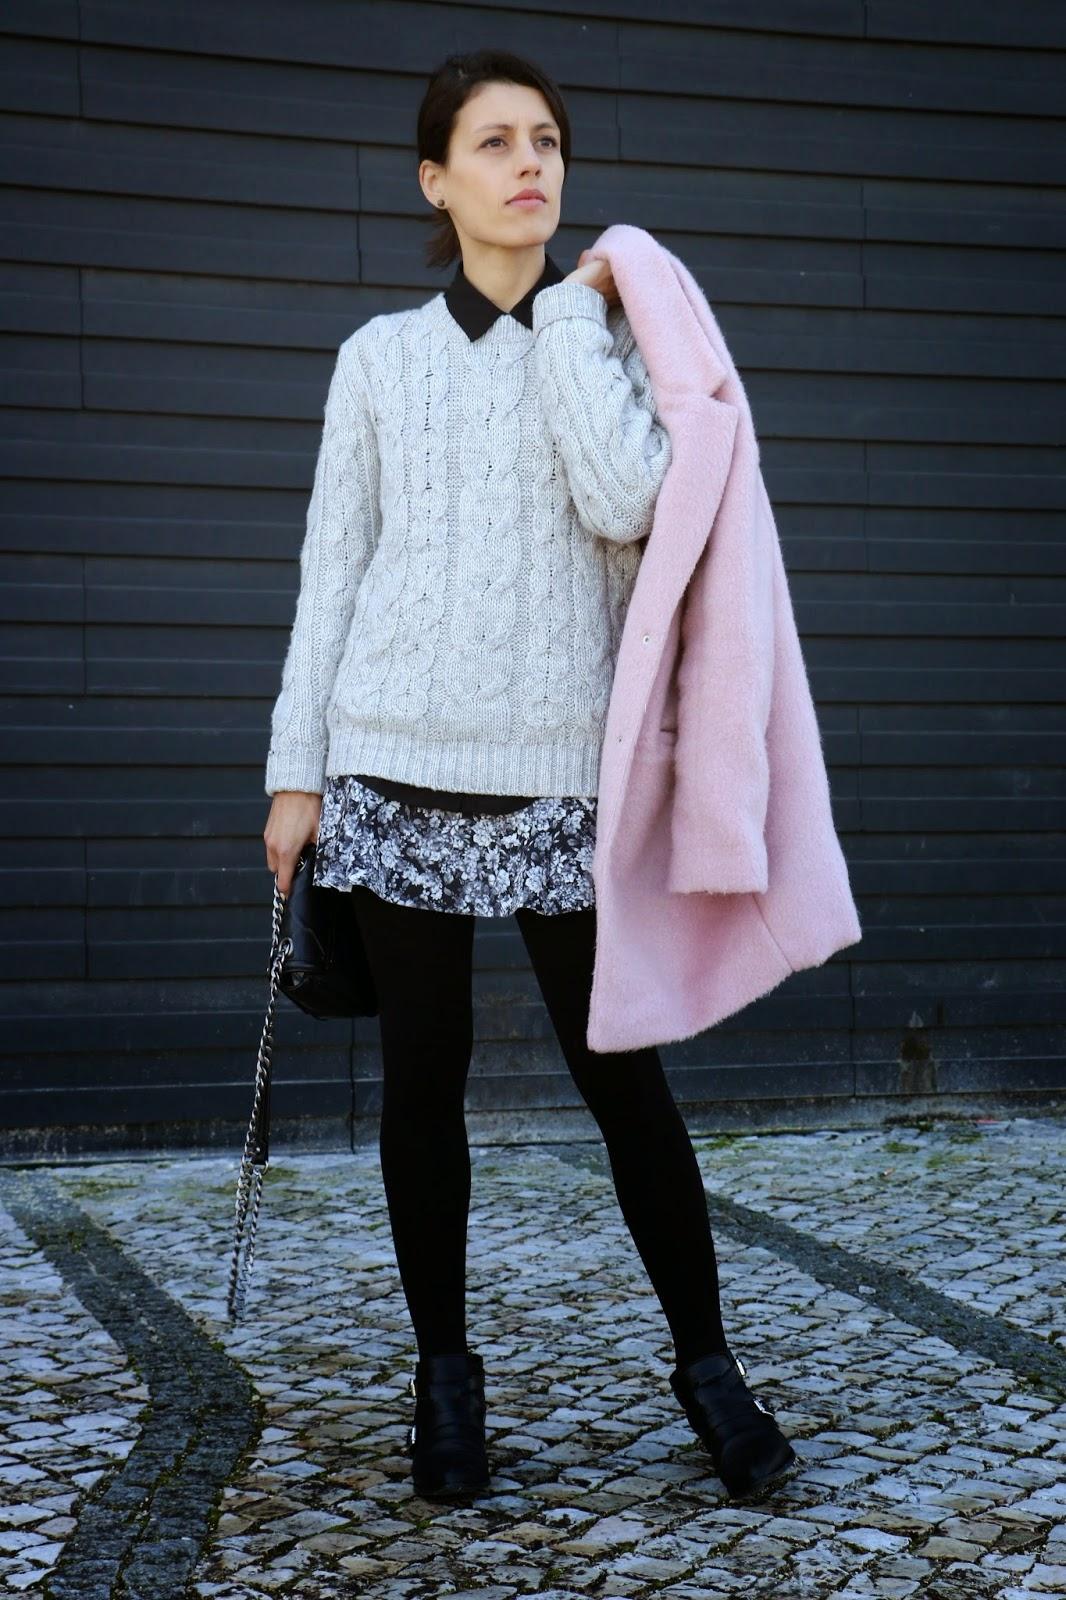 http://ilovefitametrica.blogspot.pt/2015/01/touch-of-pink.html